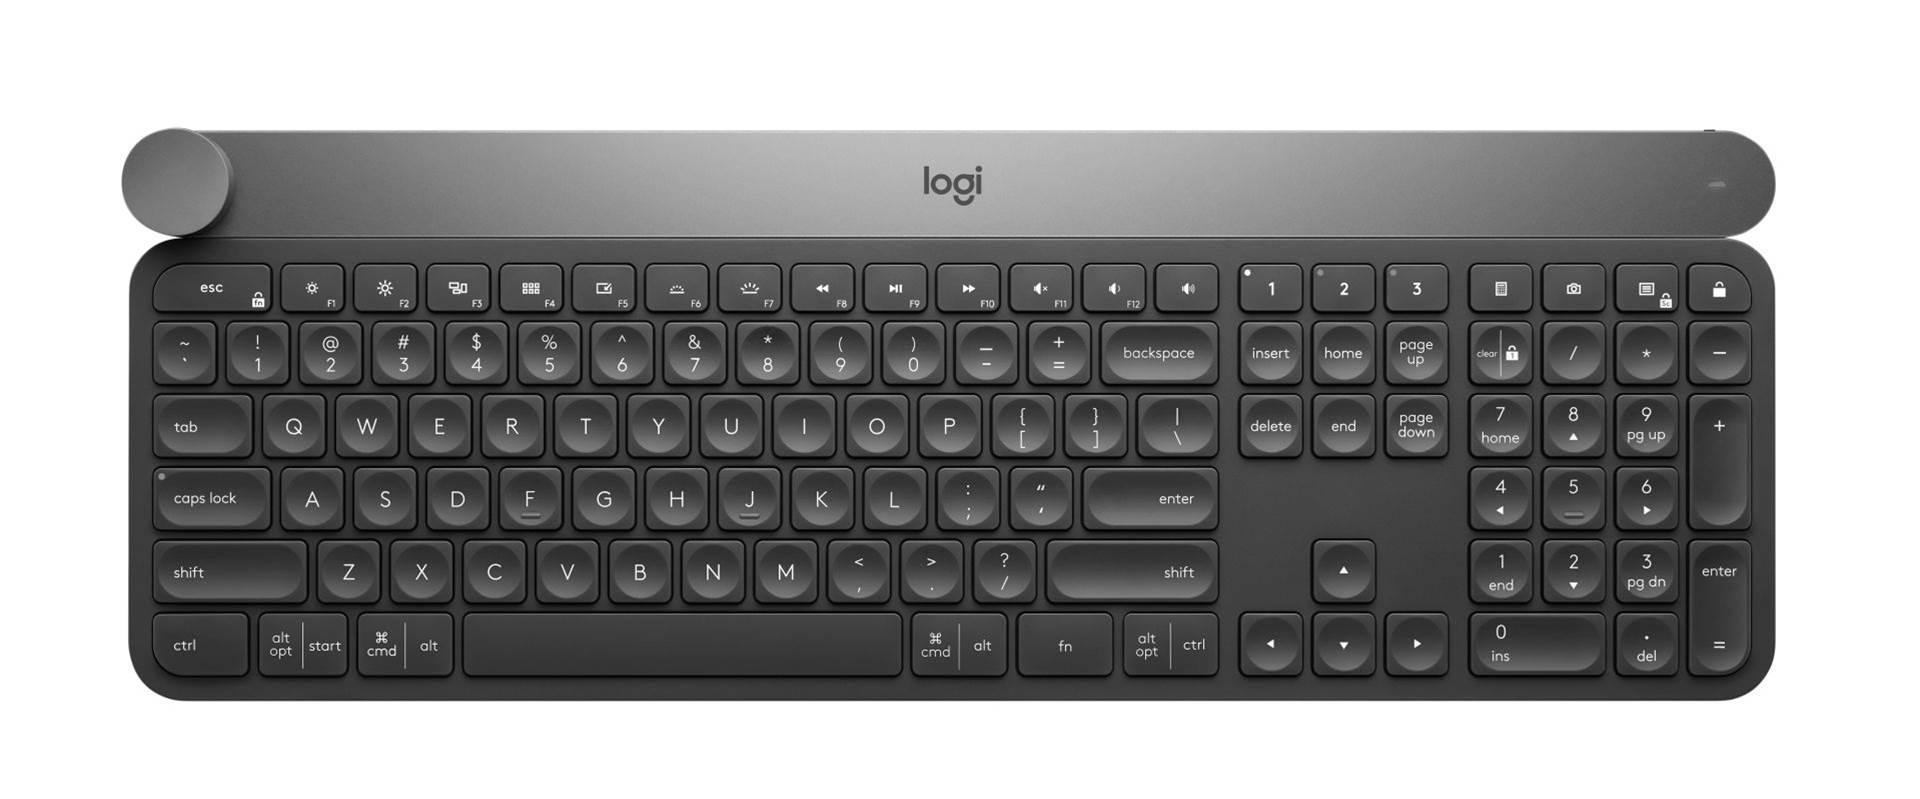 Review: Logitech Craft keyboard